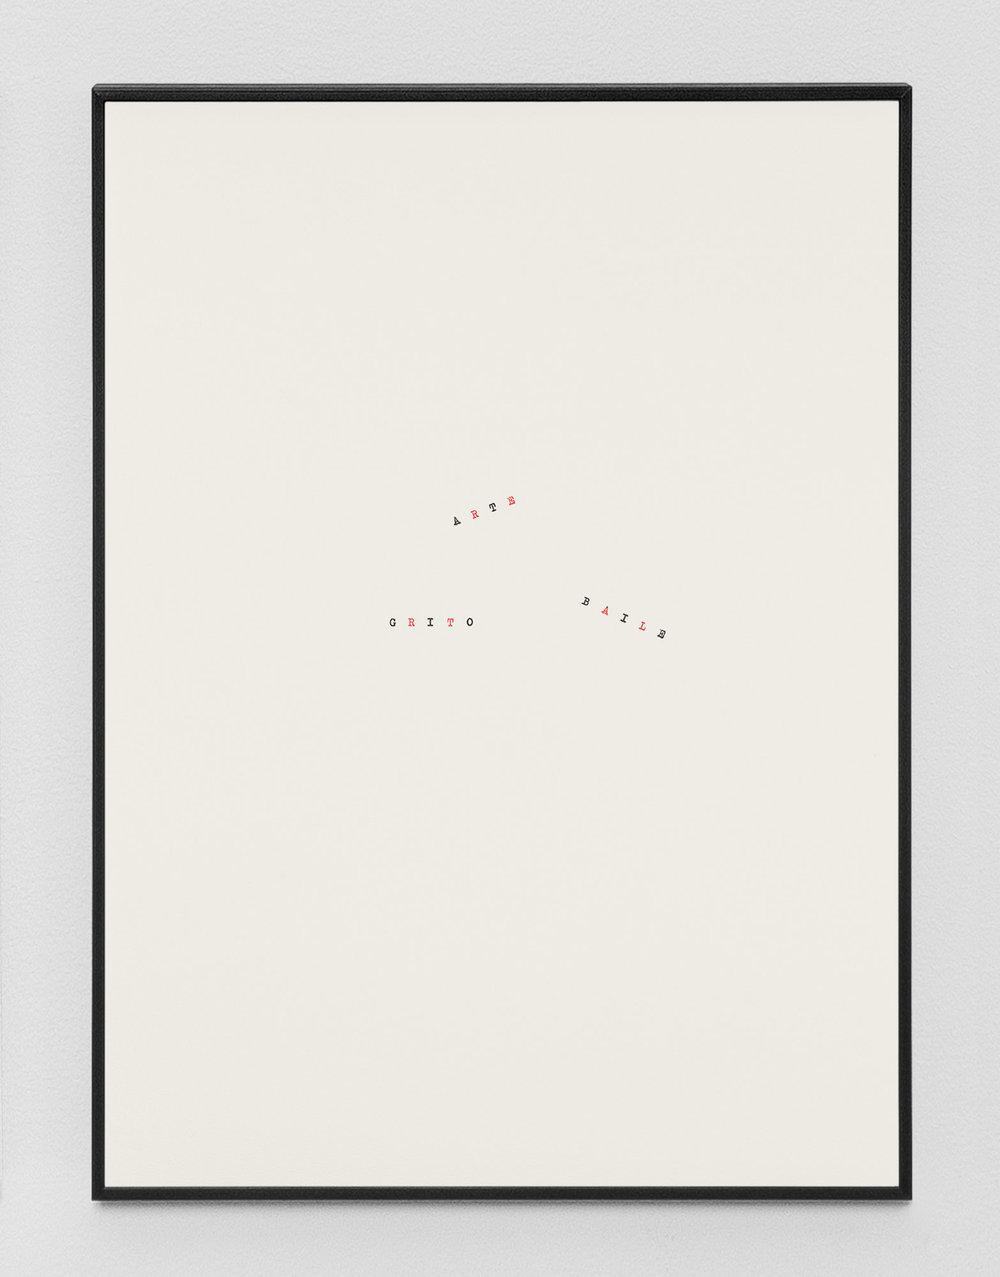 Muerte sin fin (José Gorostiza) I – XVI  , 017  Tinta sobre papel / Ink on paper  37.5 x 27.5 cm  Detalle / Detail